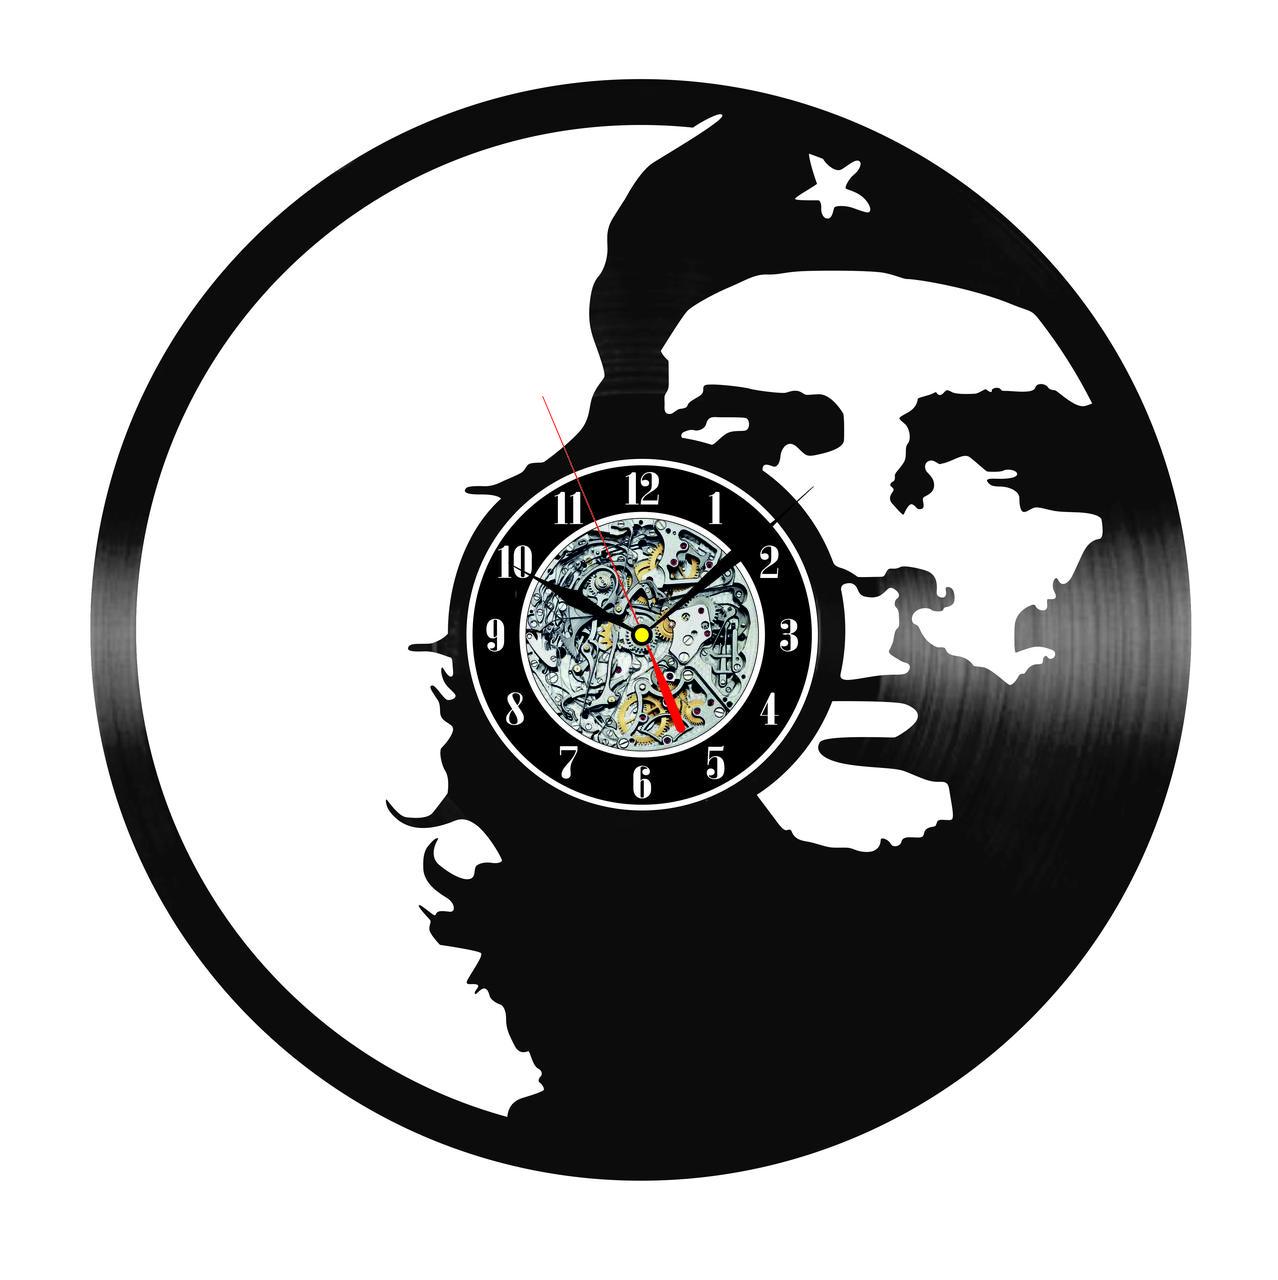 Настенные часы из виниловых пластинок LikeMark Che GUEVARA